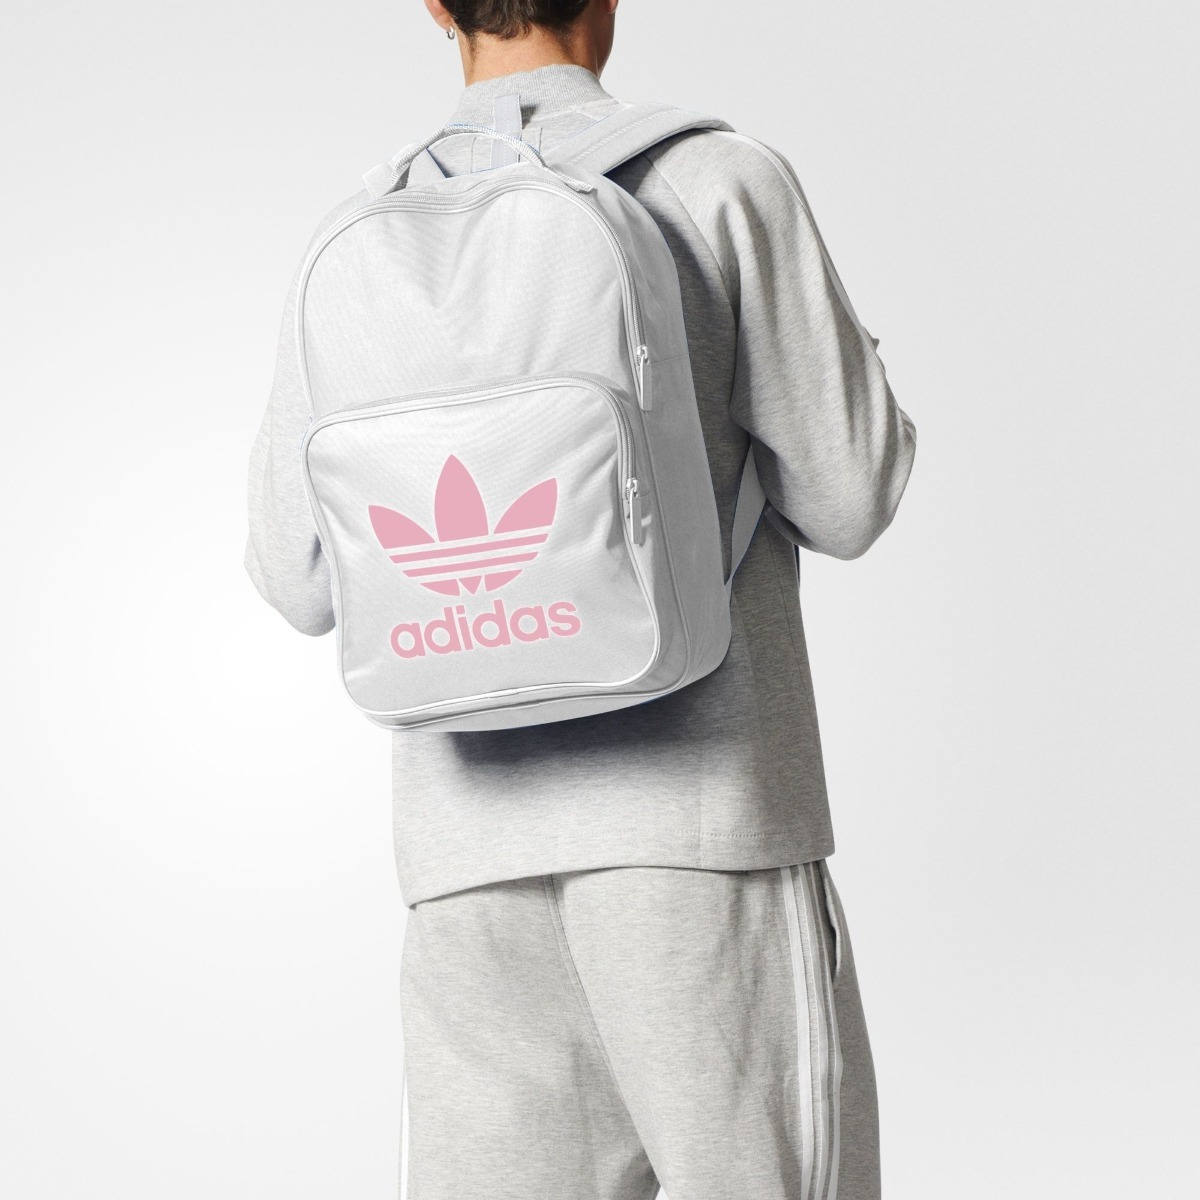 Blanca Classic Nueva Adidas Bp Trefoil Mochila 45Lj3AR